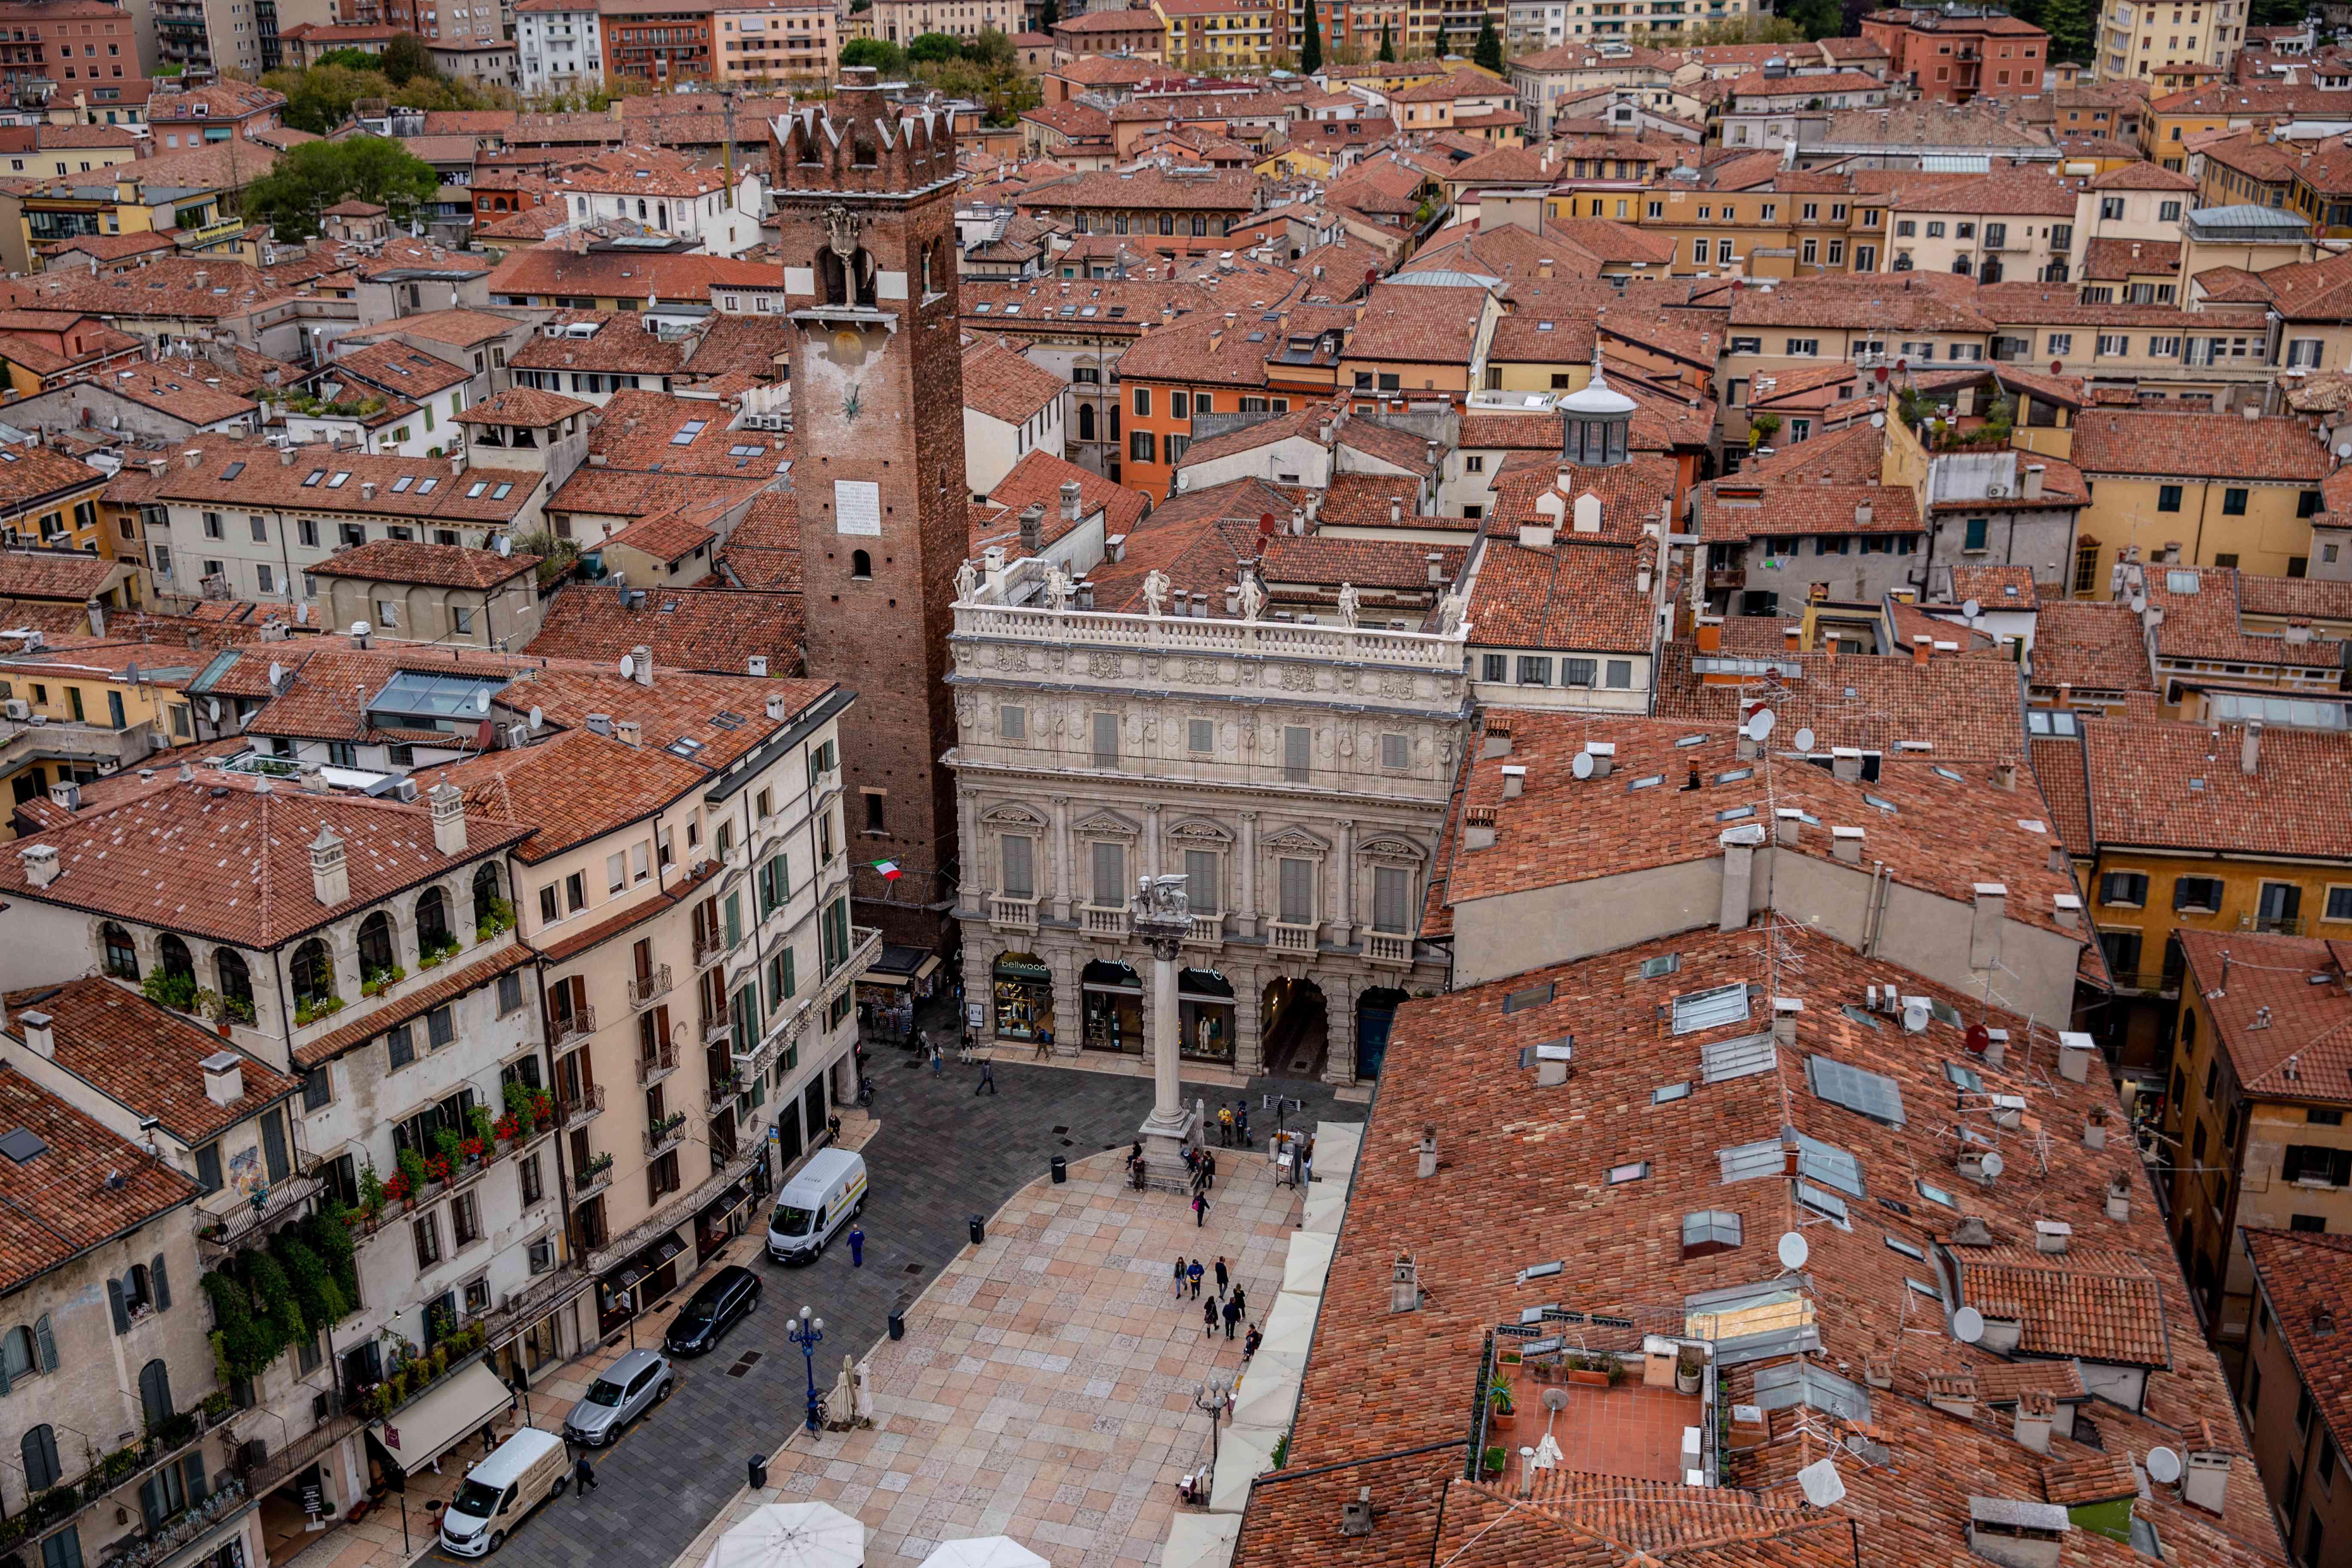 Piazza delle Erbe from above in Verona, Italy